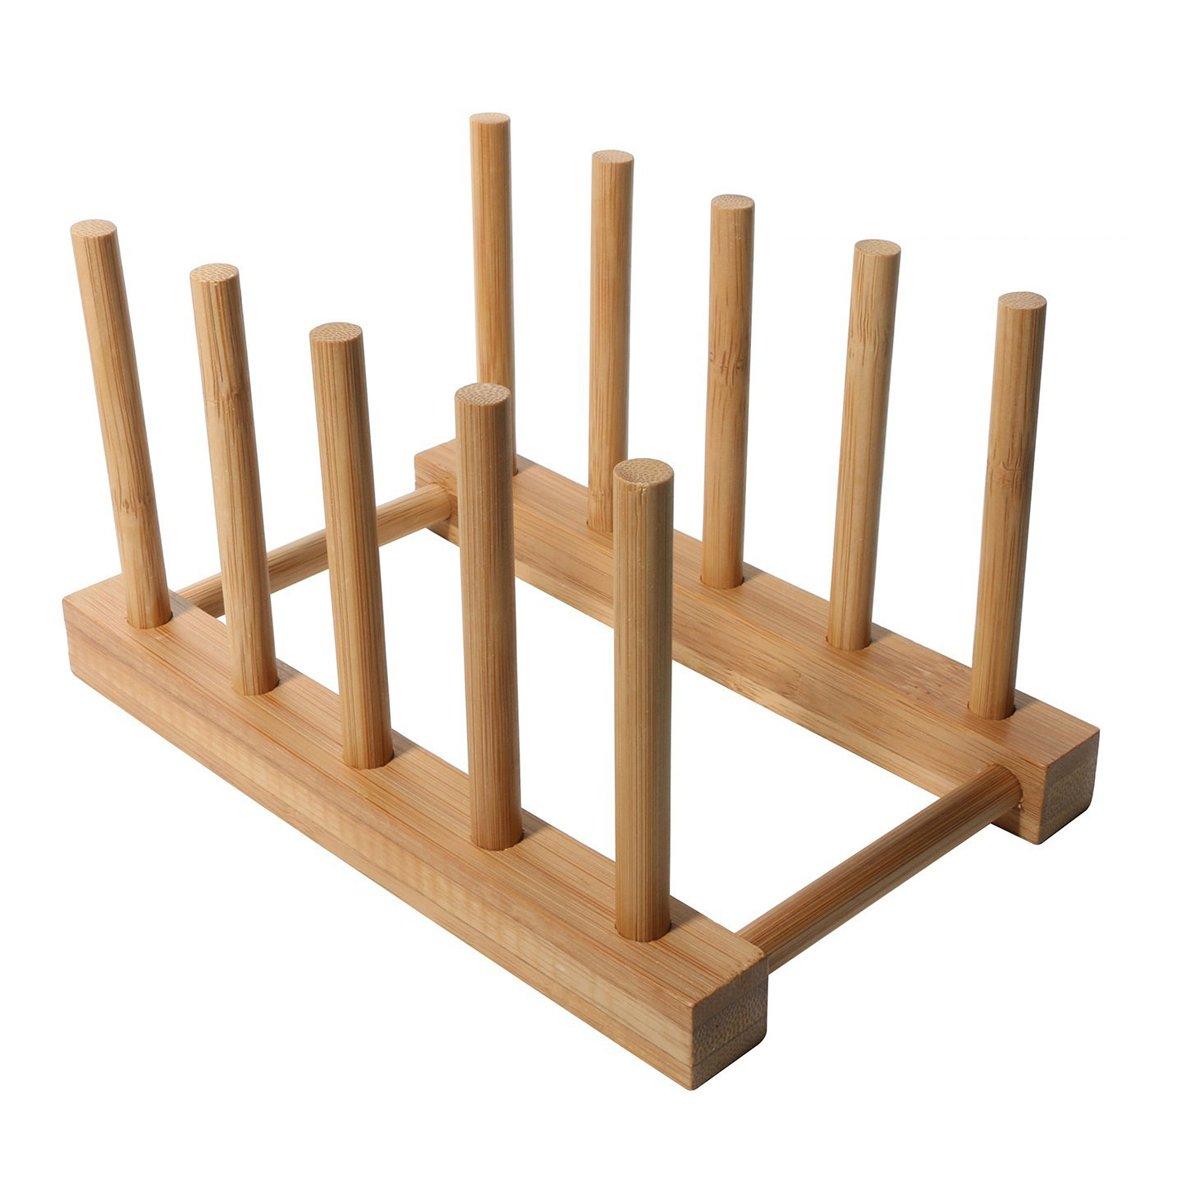 Home Kitchen Bamboo Plate Rack/Pot Lid Holder Detearing Holder detachable Crazy Ant